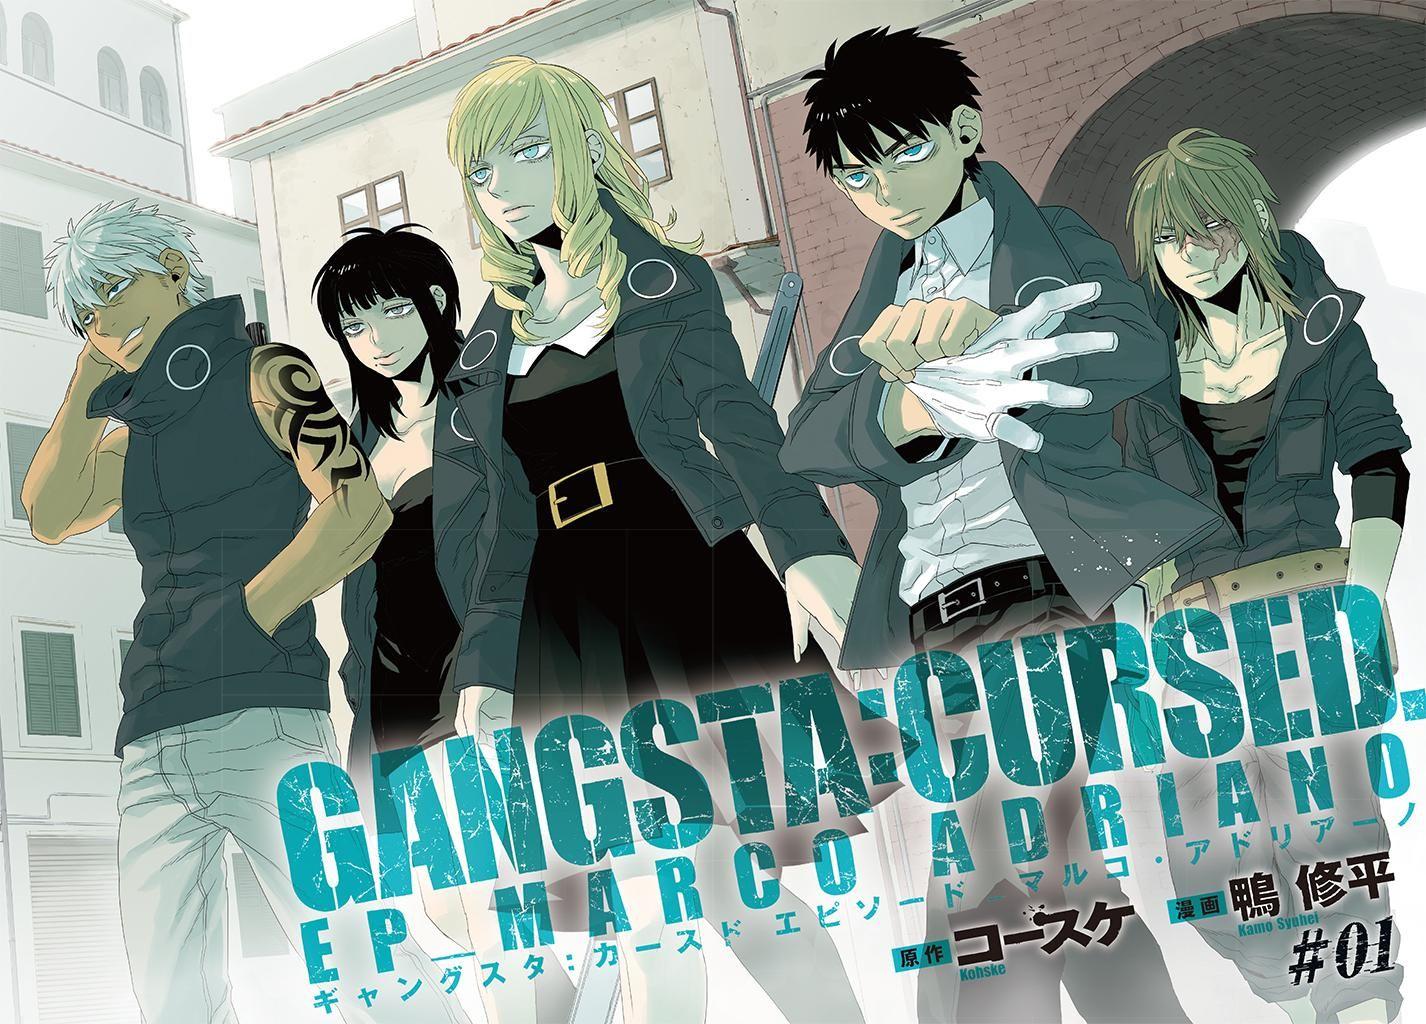 GangstaCursed EP_Marco Adriano 1.00 por NovaScan